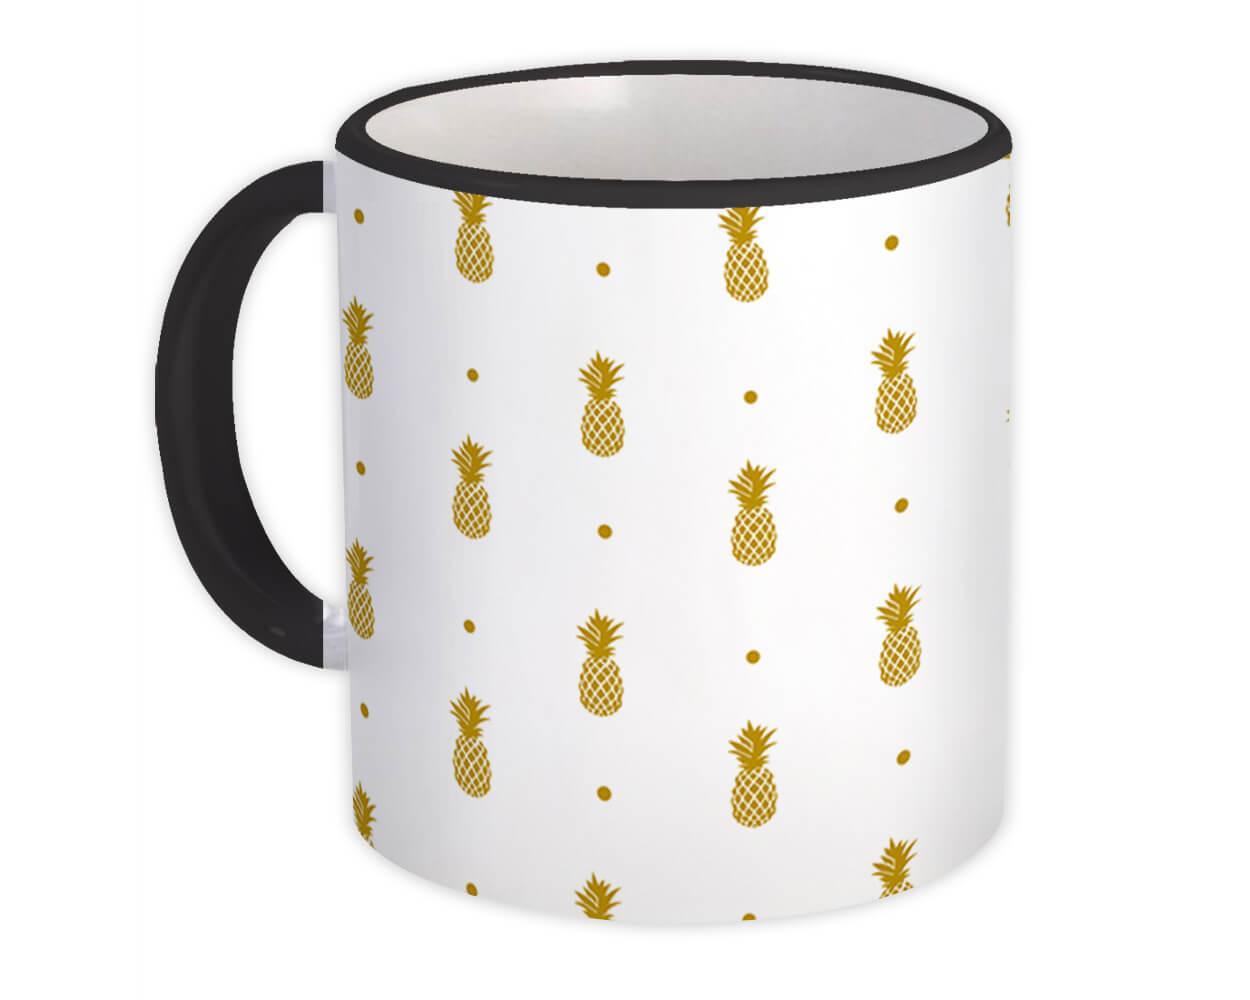 Pineapple : Gift Mug Tropical Trend Decor Name Modern Pastel Super Chic